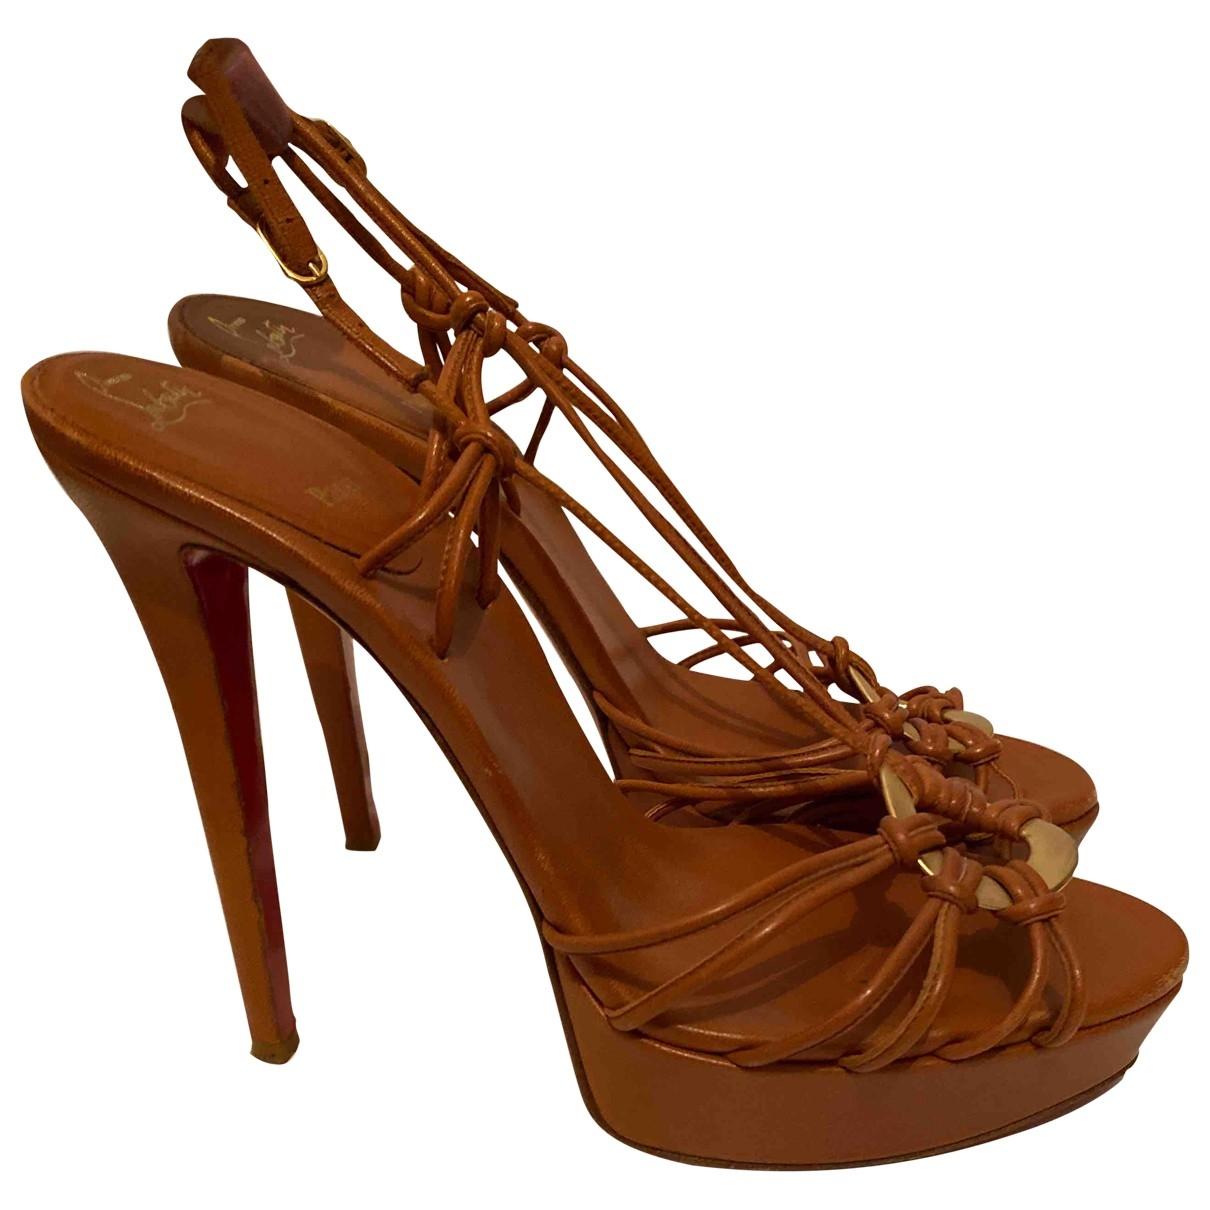 Christian Louboutin \N Camel Leather Sandals for Women 39 EU